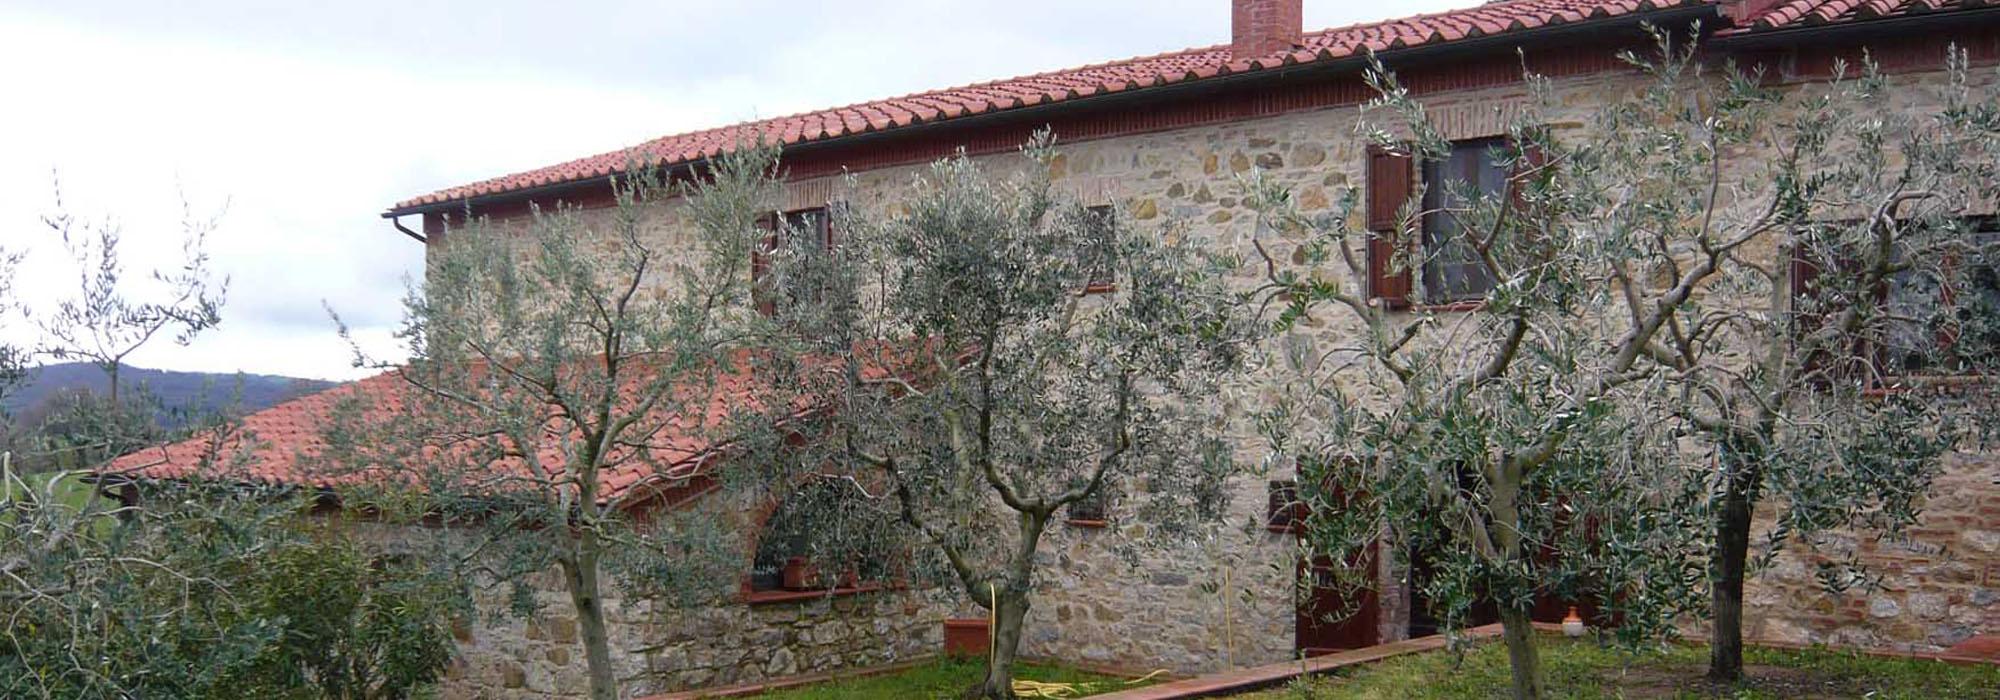 Casale in Toscana a Scansano